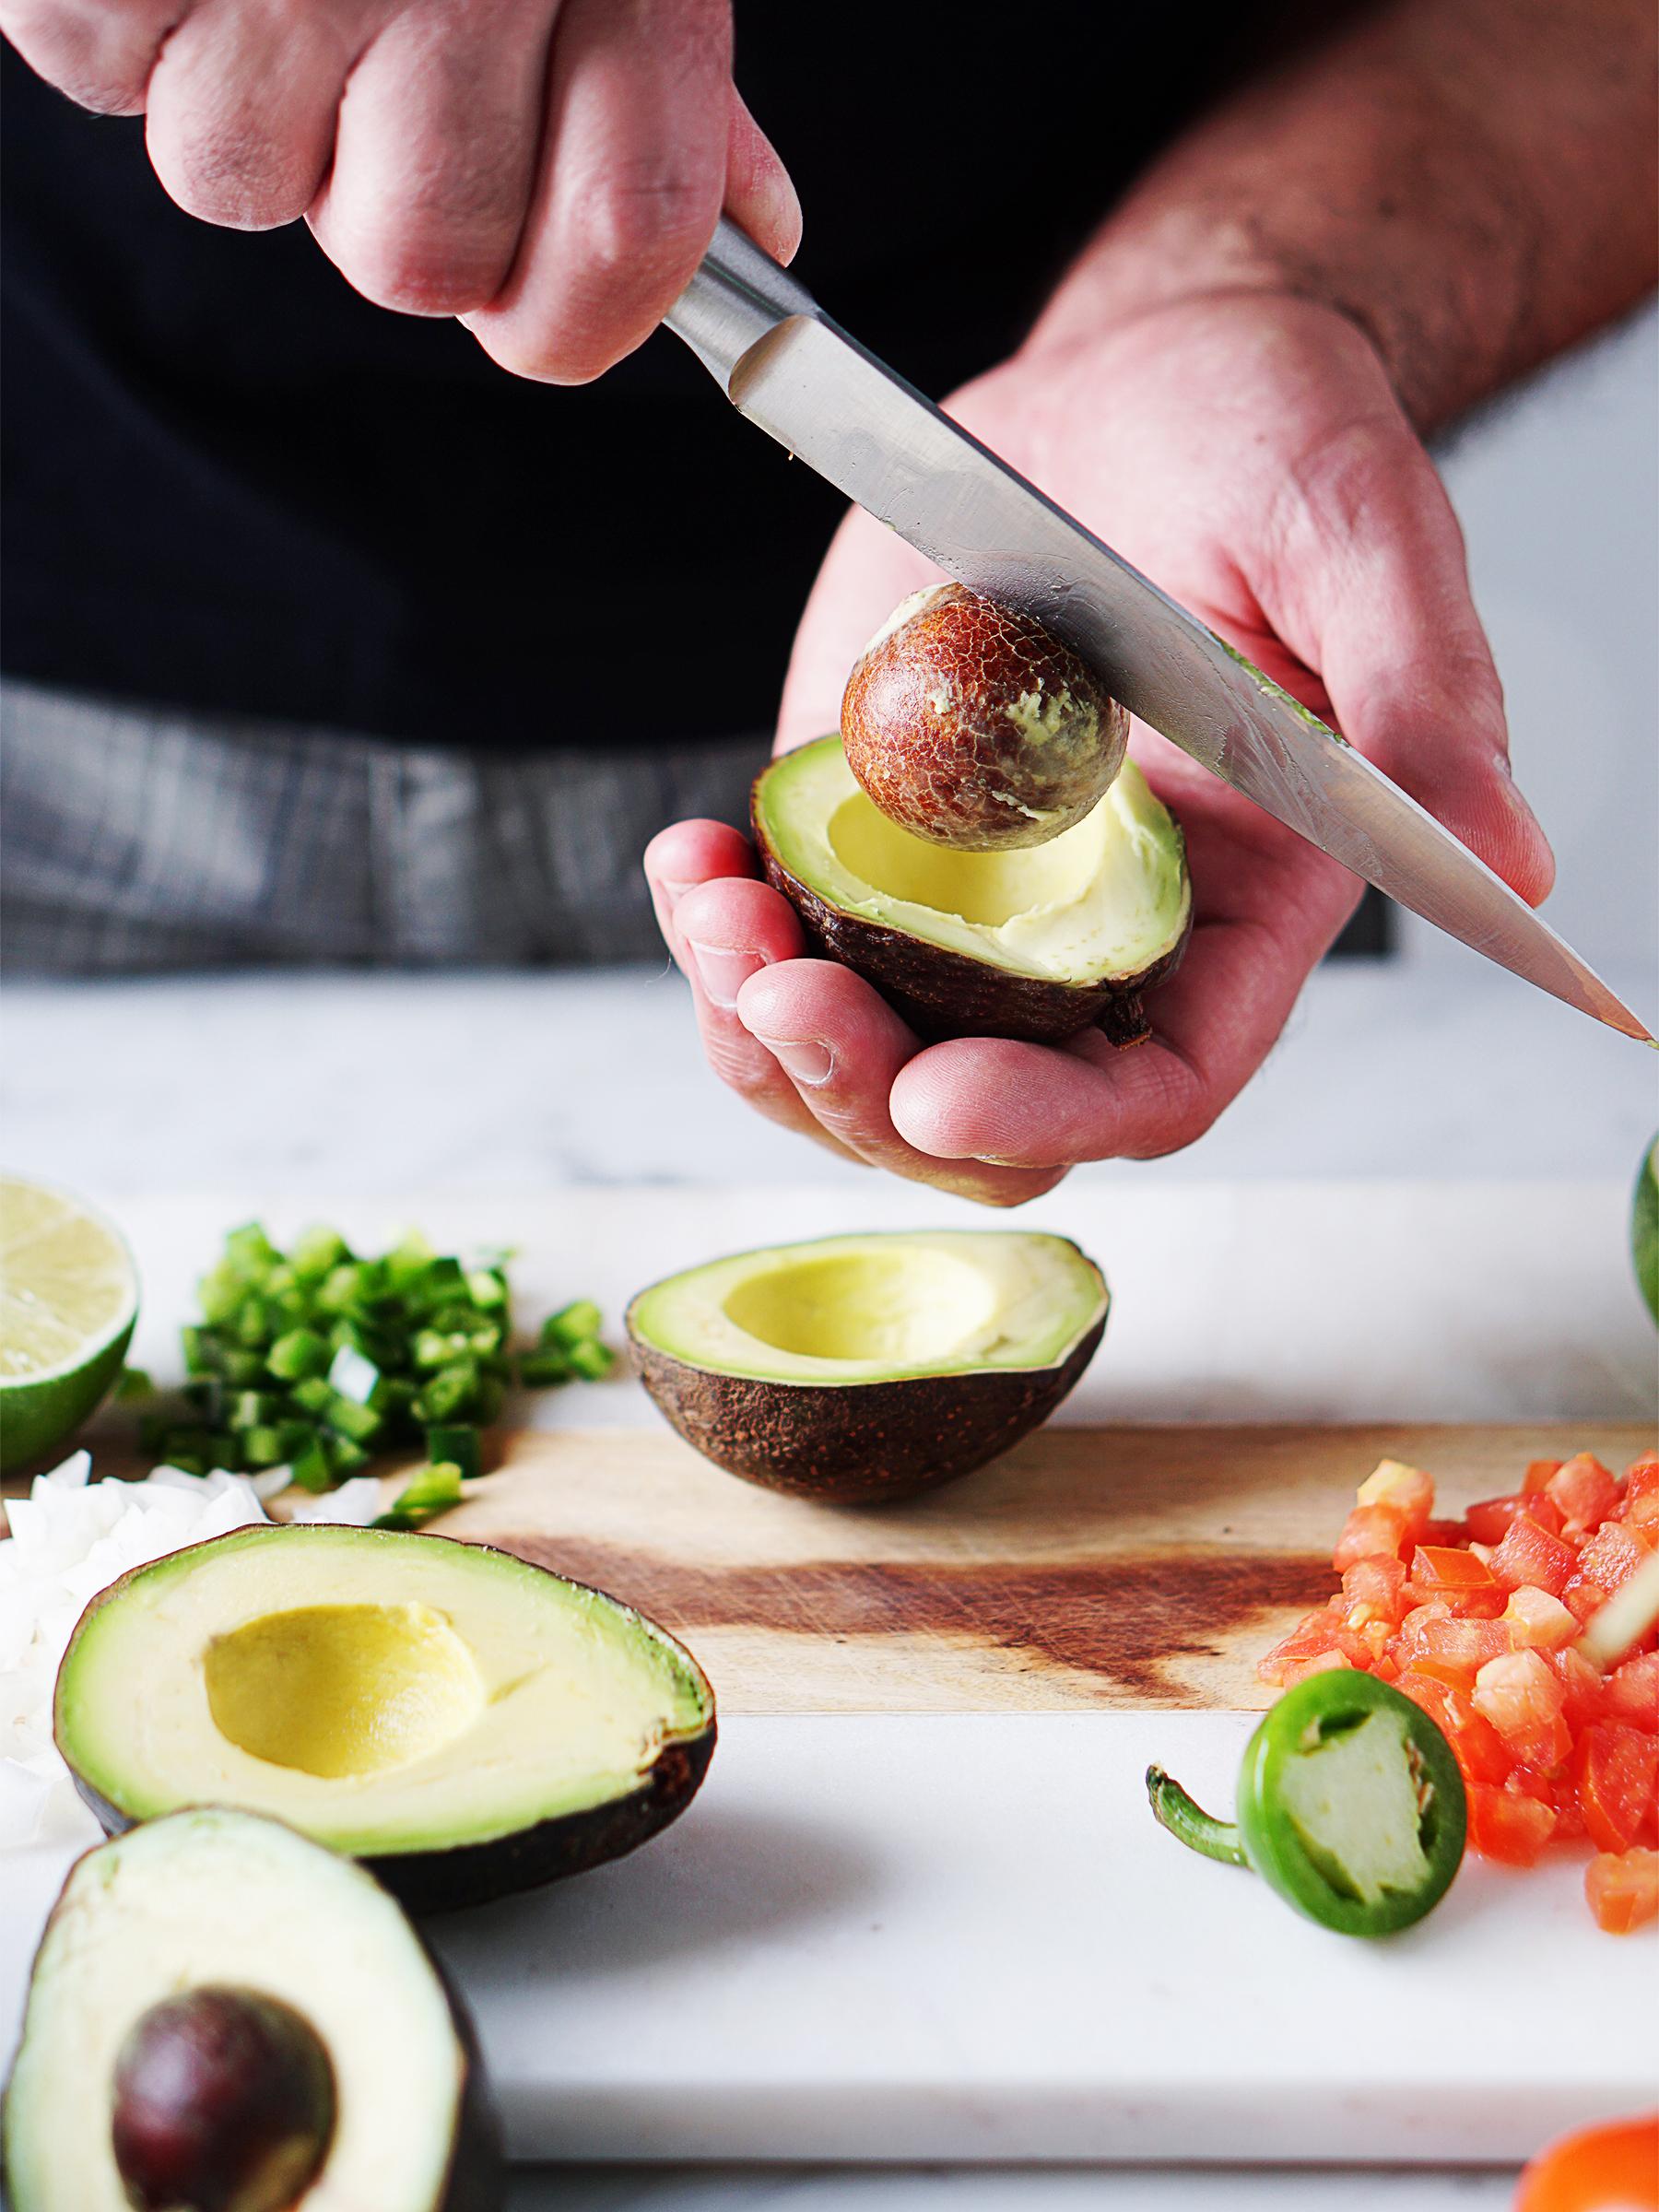 a man cutting an avocado